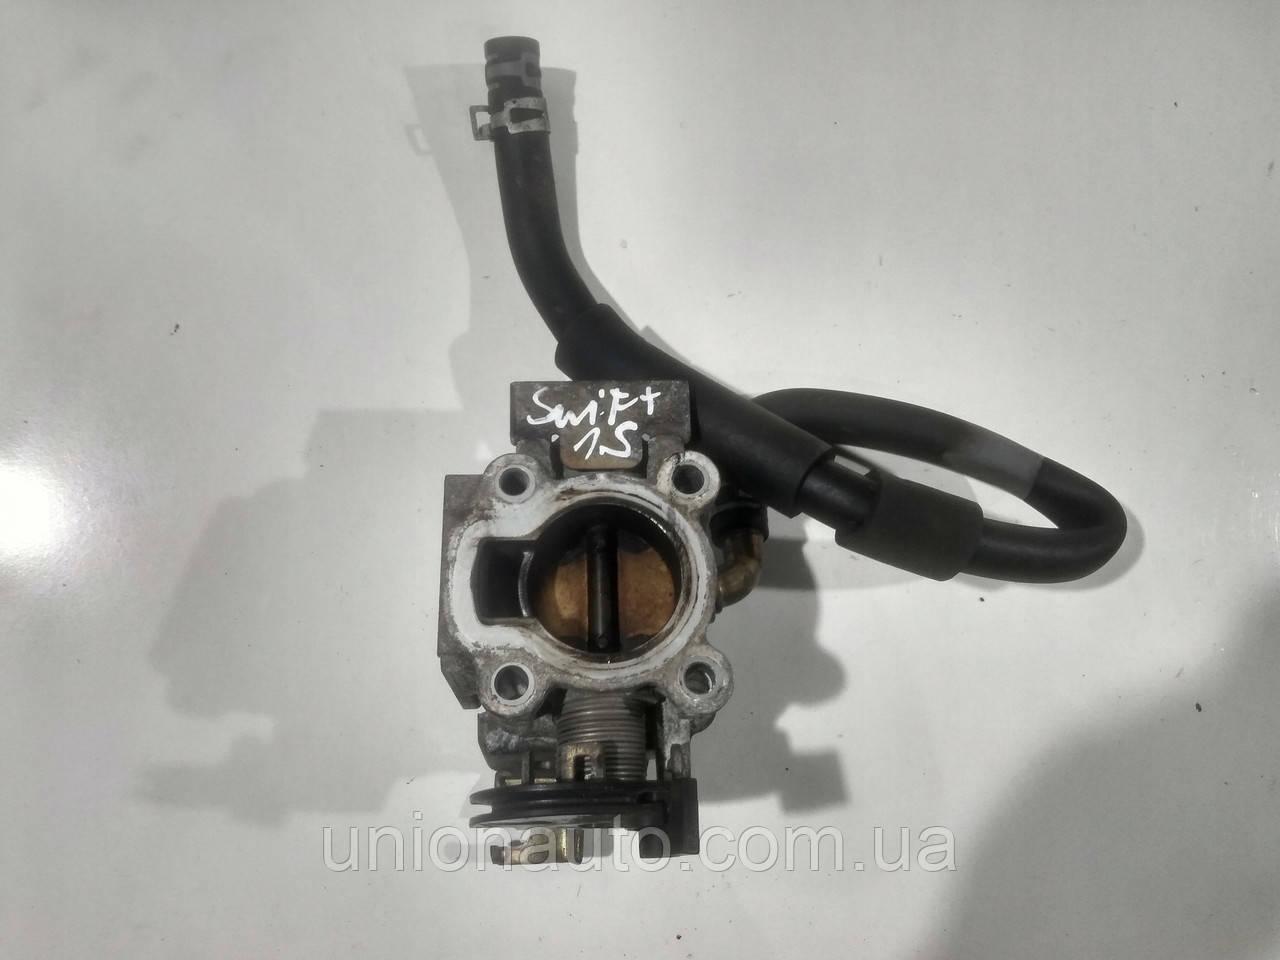 Дроссельная заслонка SUZUKI SWIFT III MK6 1.5